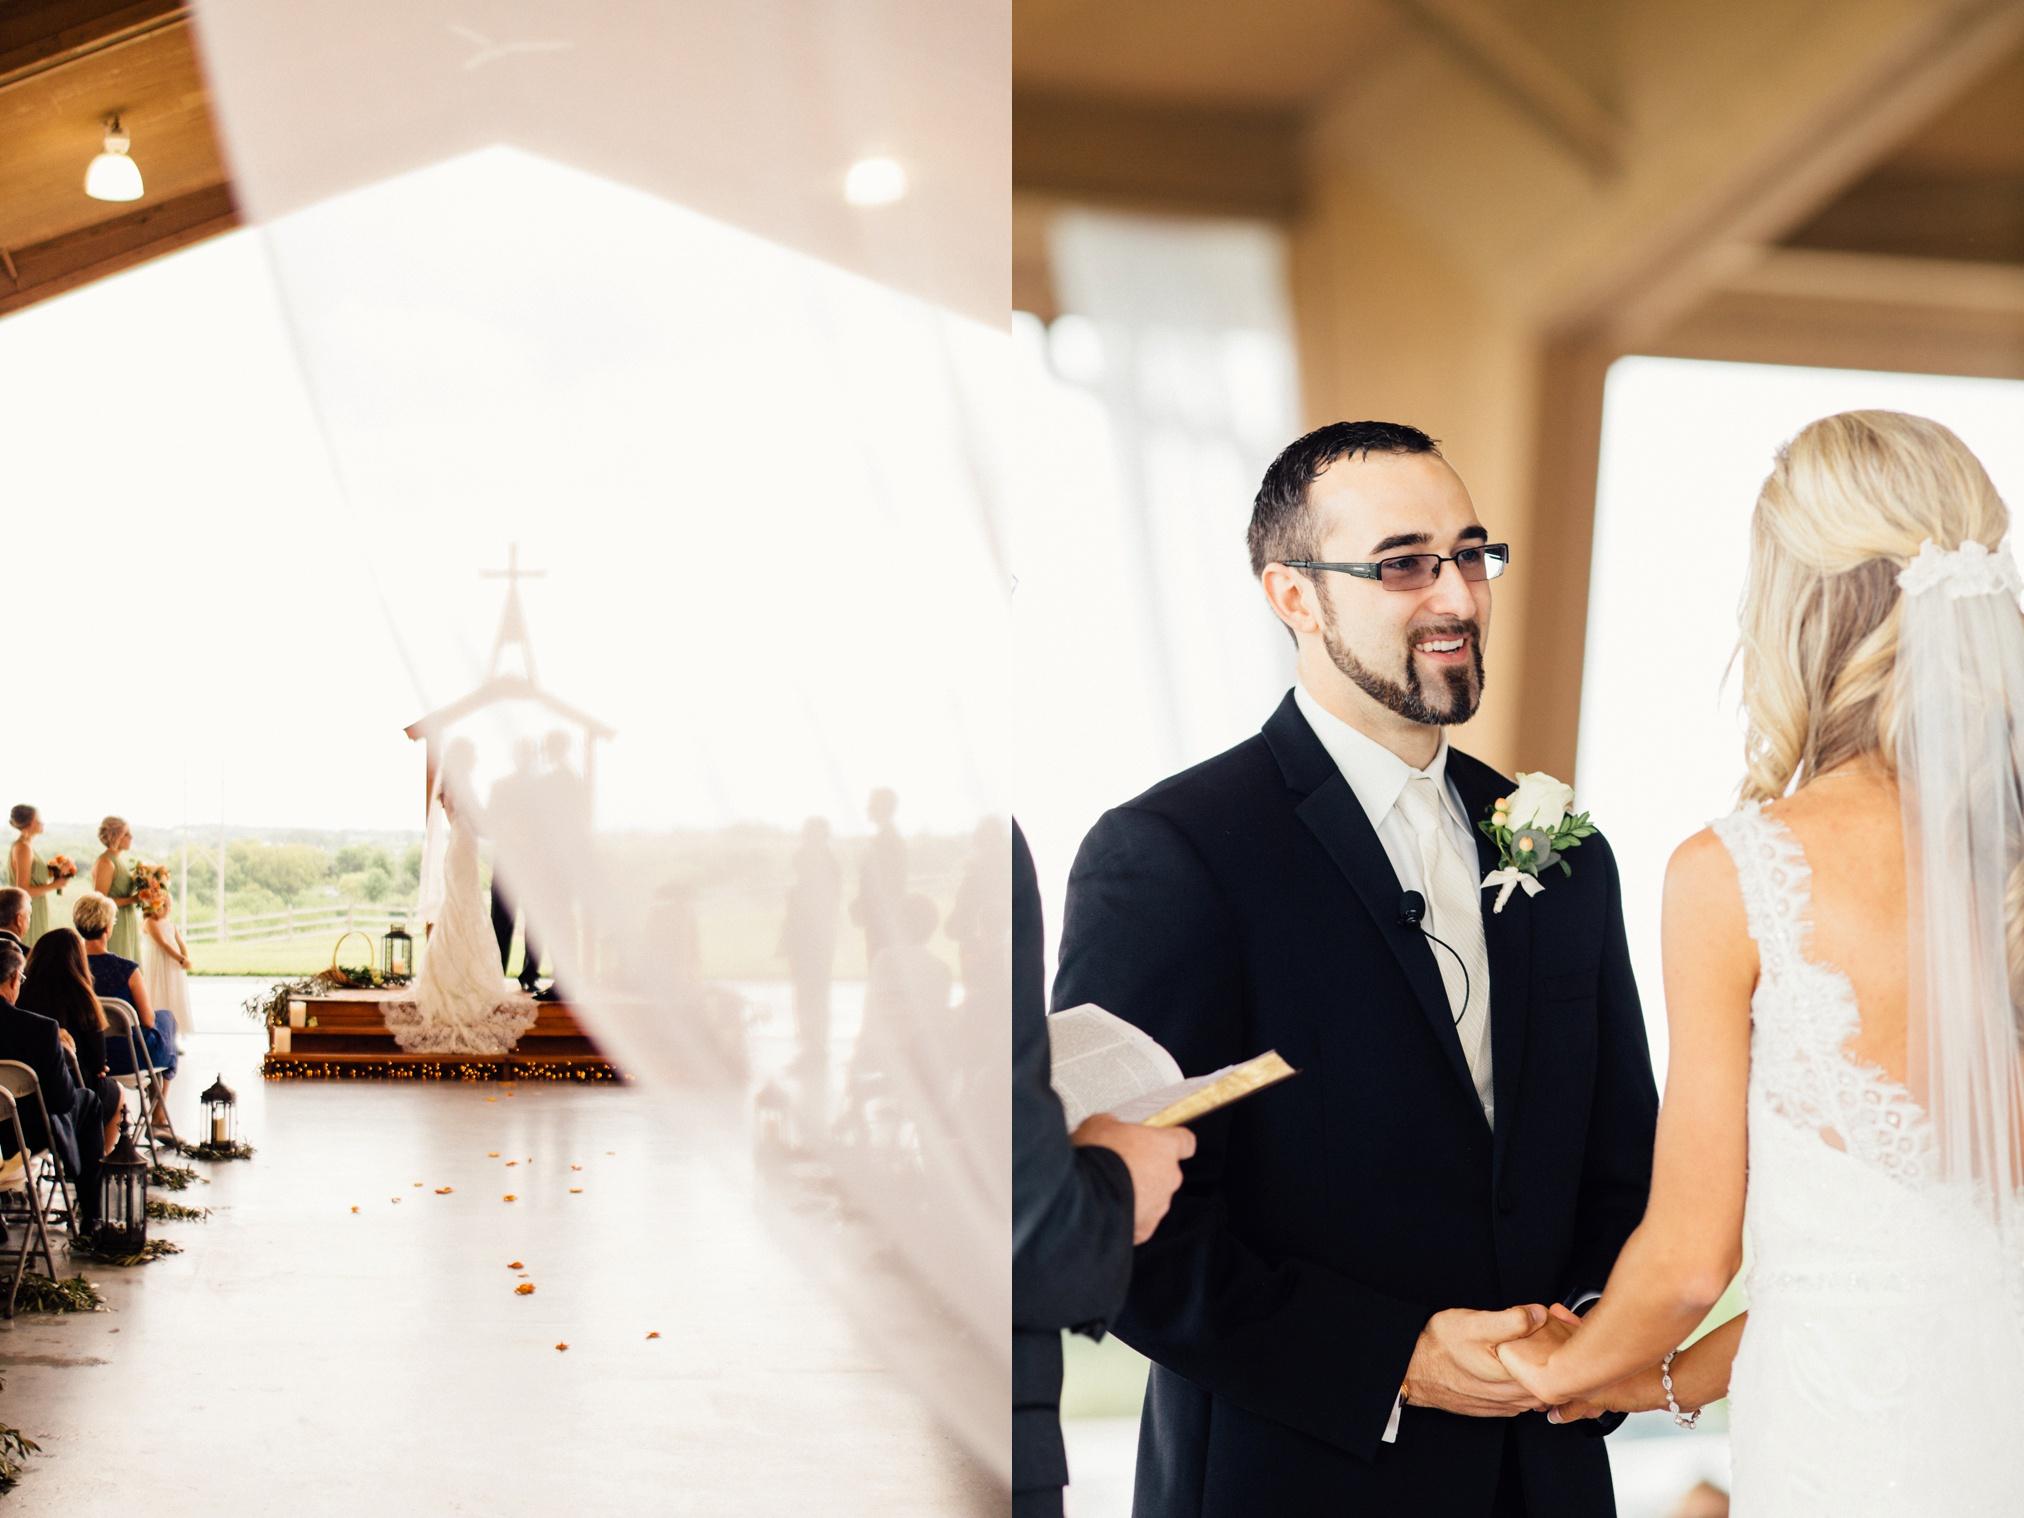 schmid_wedding-505.jpg